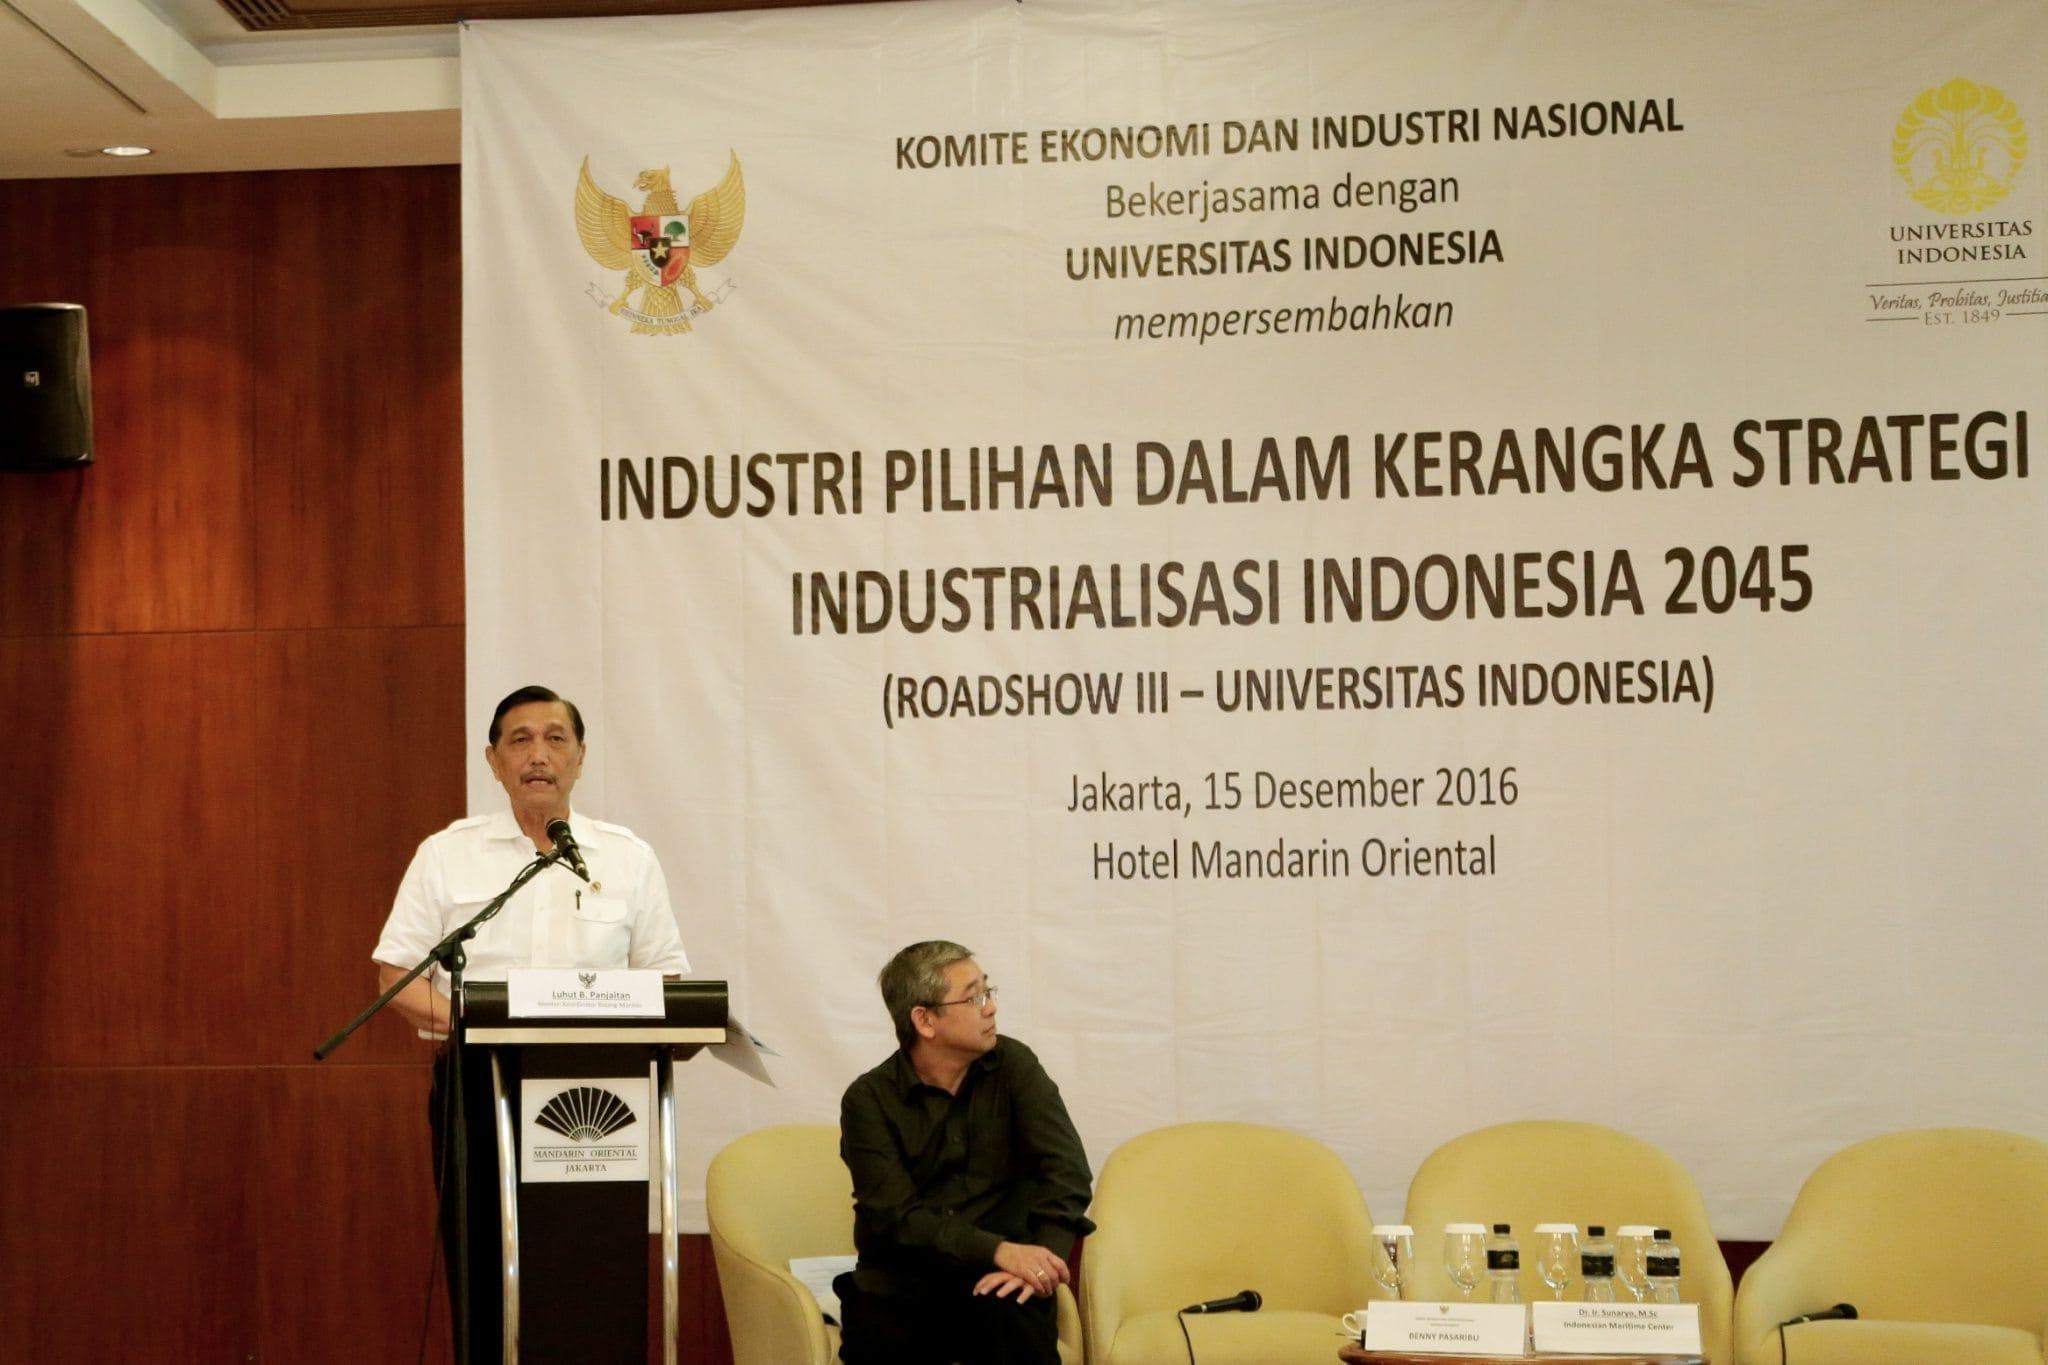 Menko Maritim Luhut B. Pandjaitan saat menjadi Narasumber dalam acara FGD Pilihan Industri KEIN di Hotel Mandarin Oriental, Jakarta (15/12)